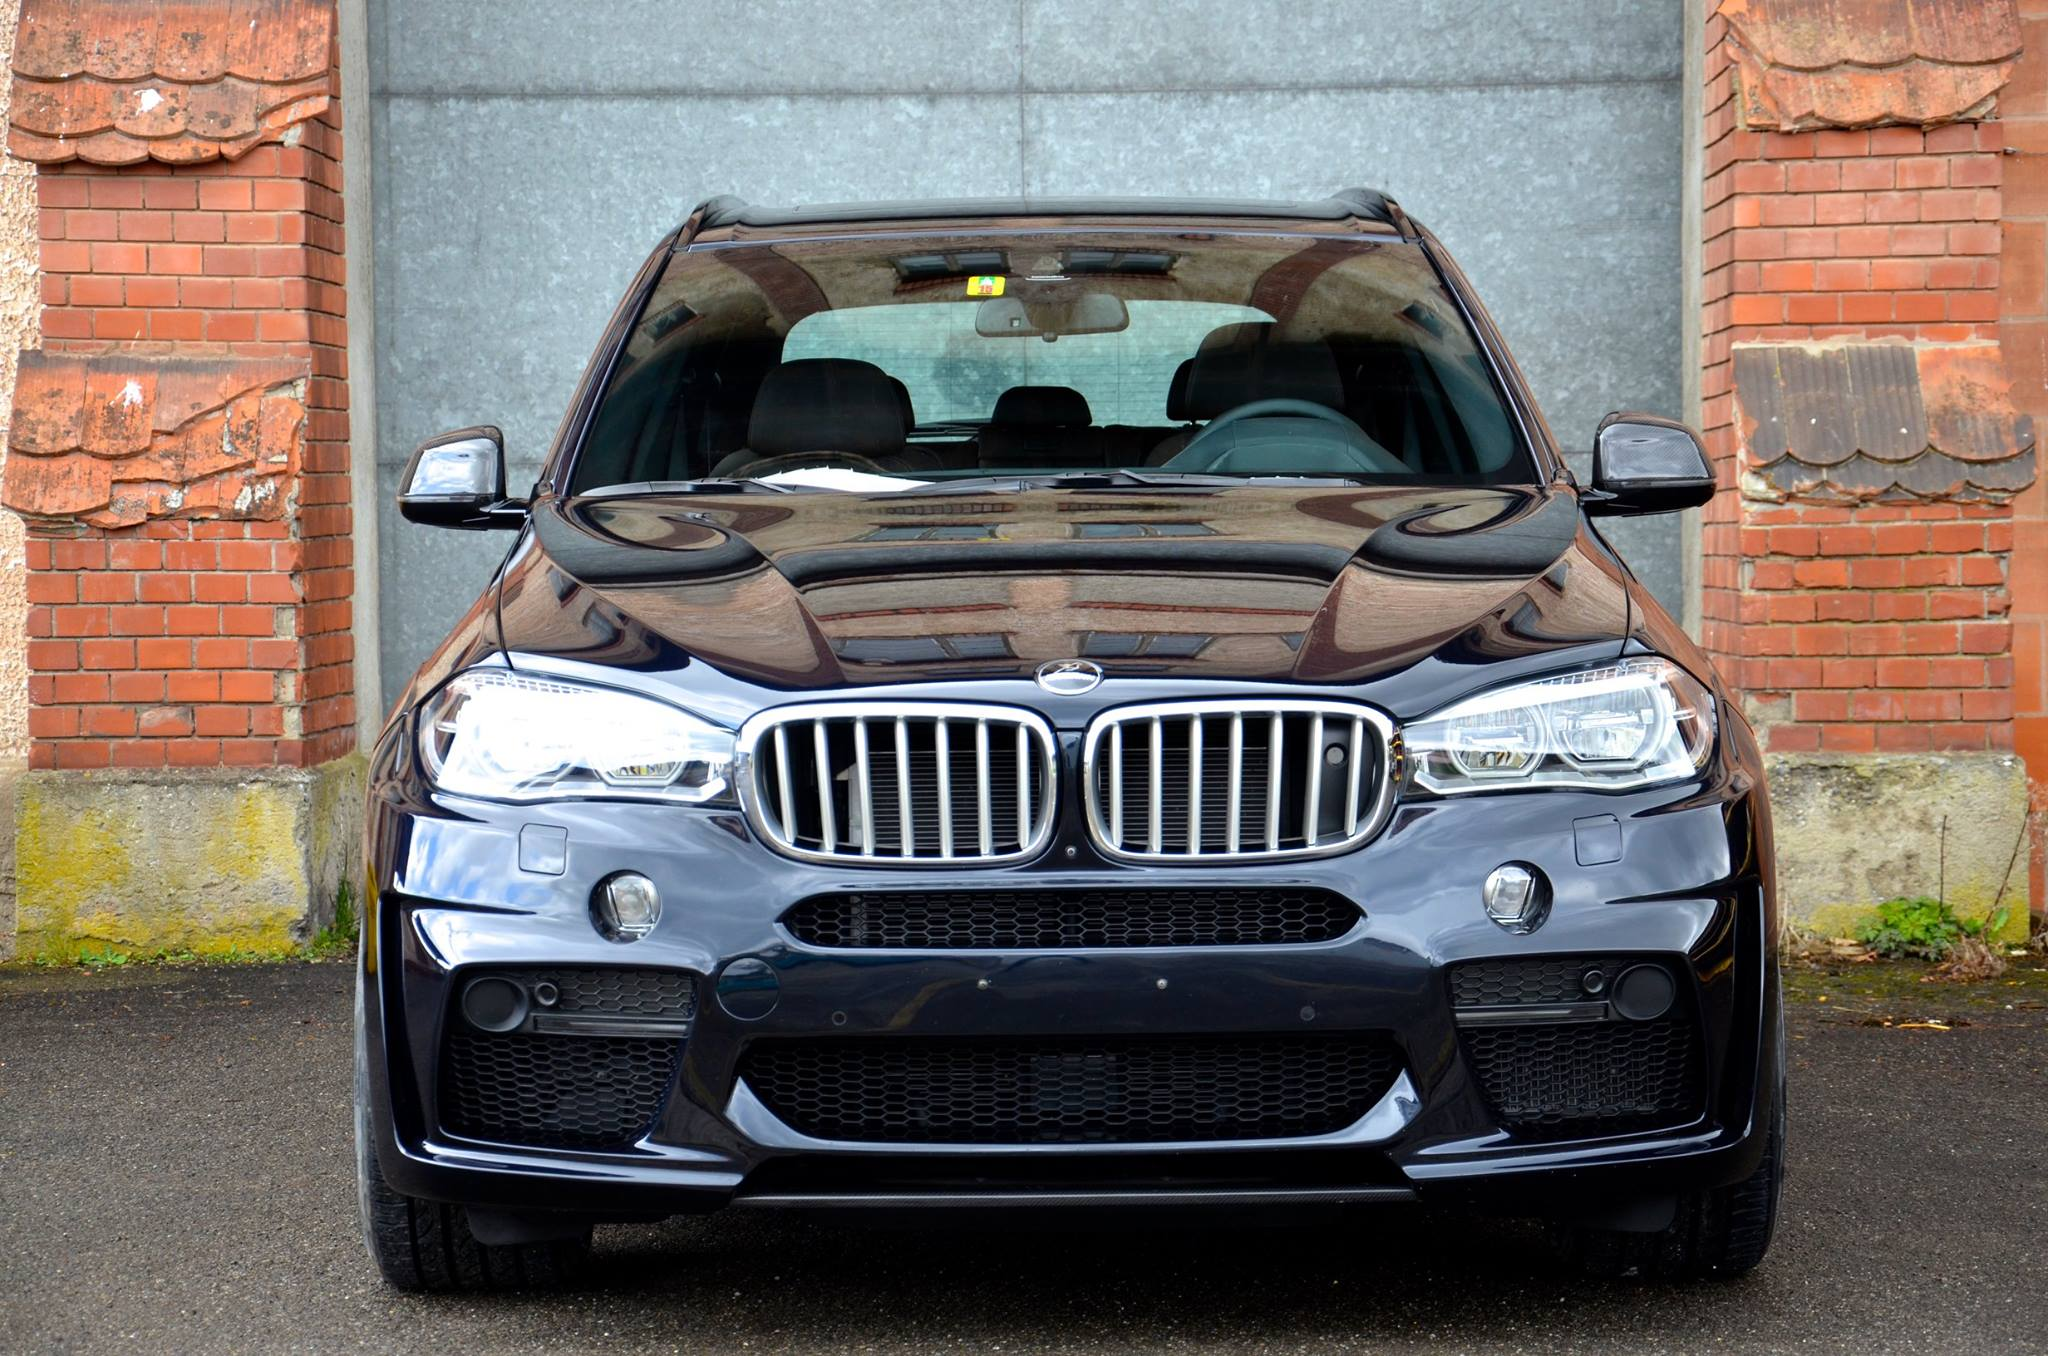 Hamann BMW X5 F15 Tuning Bodykit Widebody 02